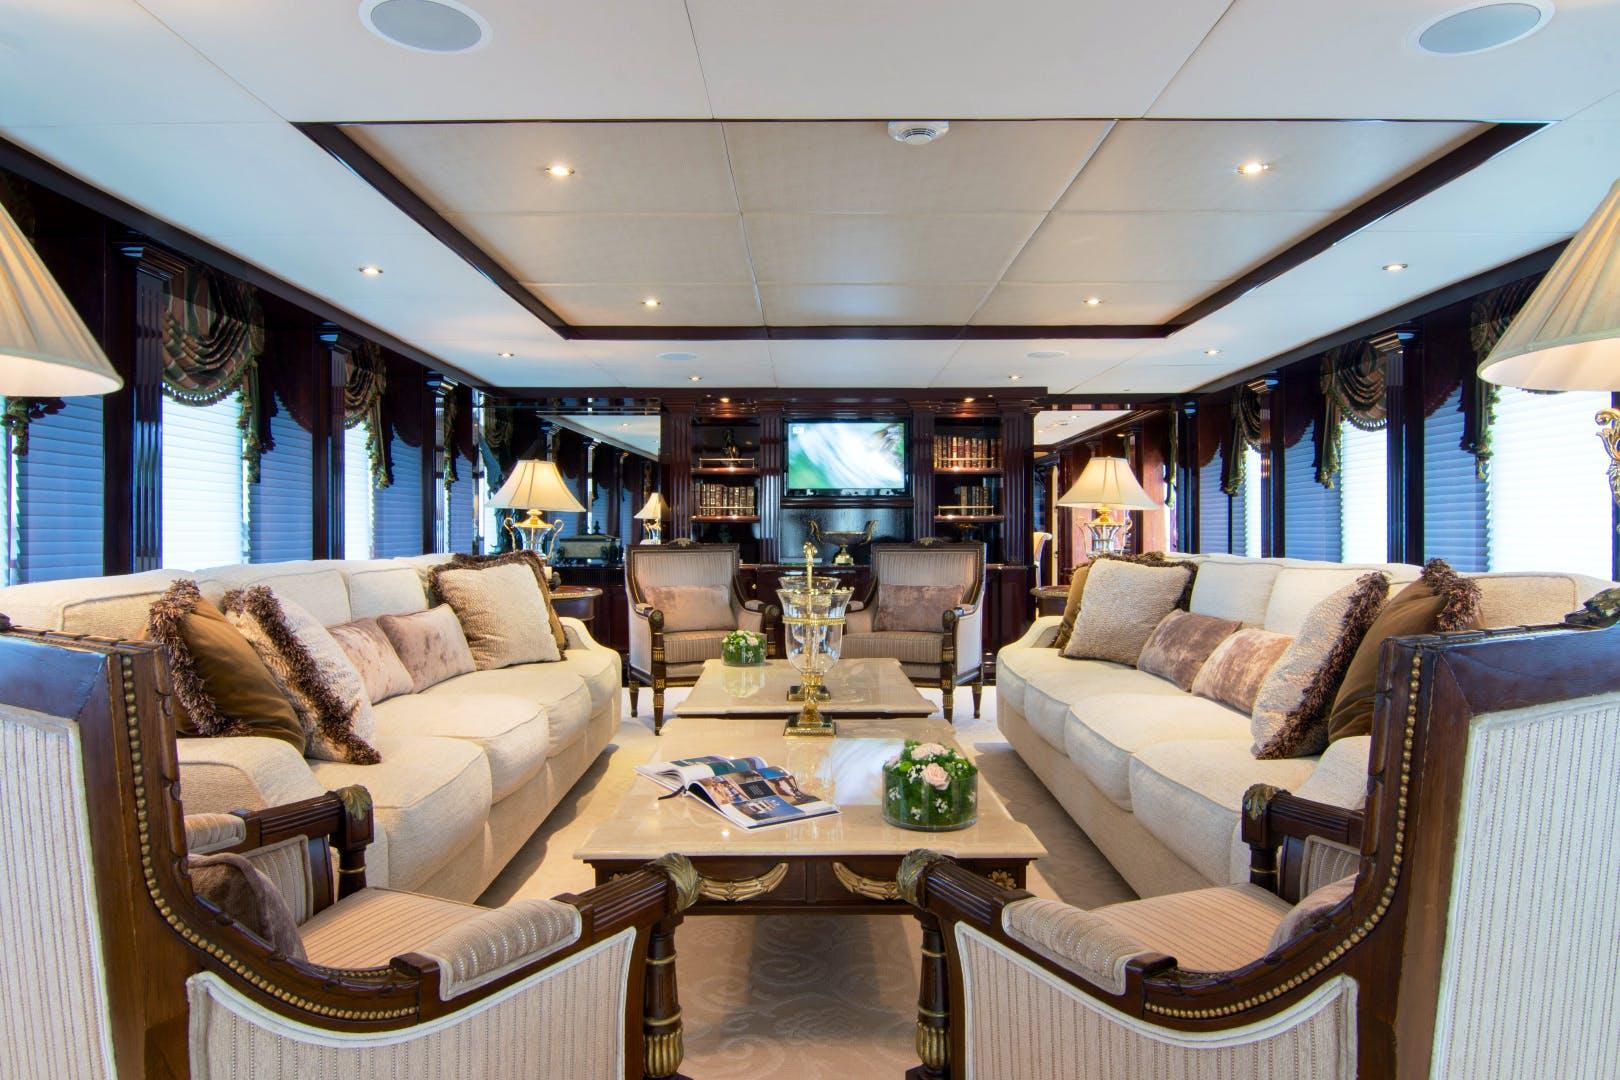 IONIAN PRINCESS Yacht for Sale | 150 Christensen 2005